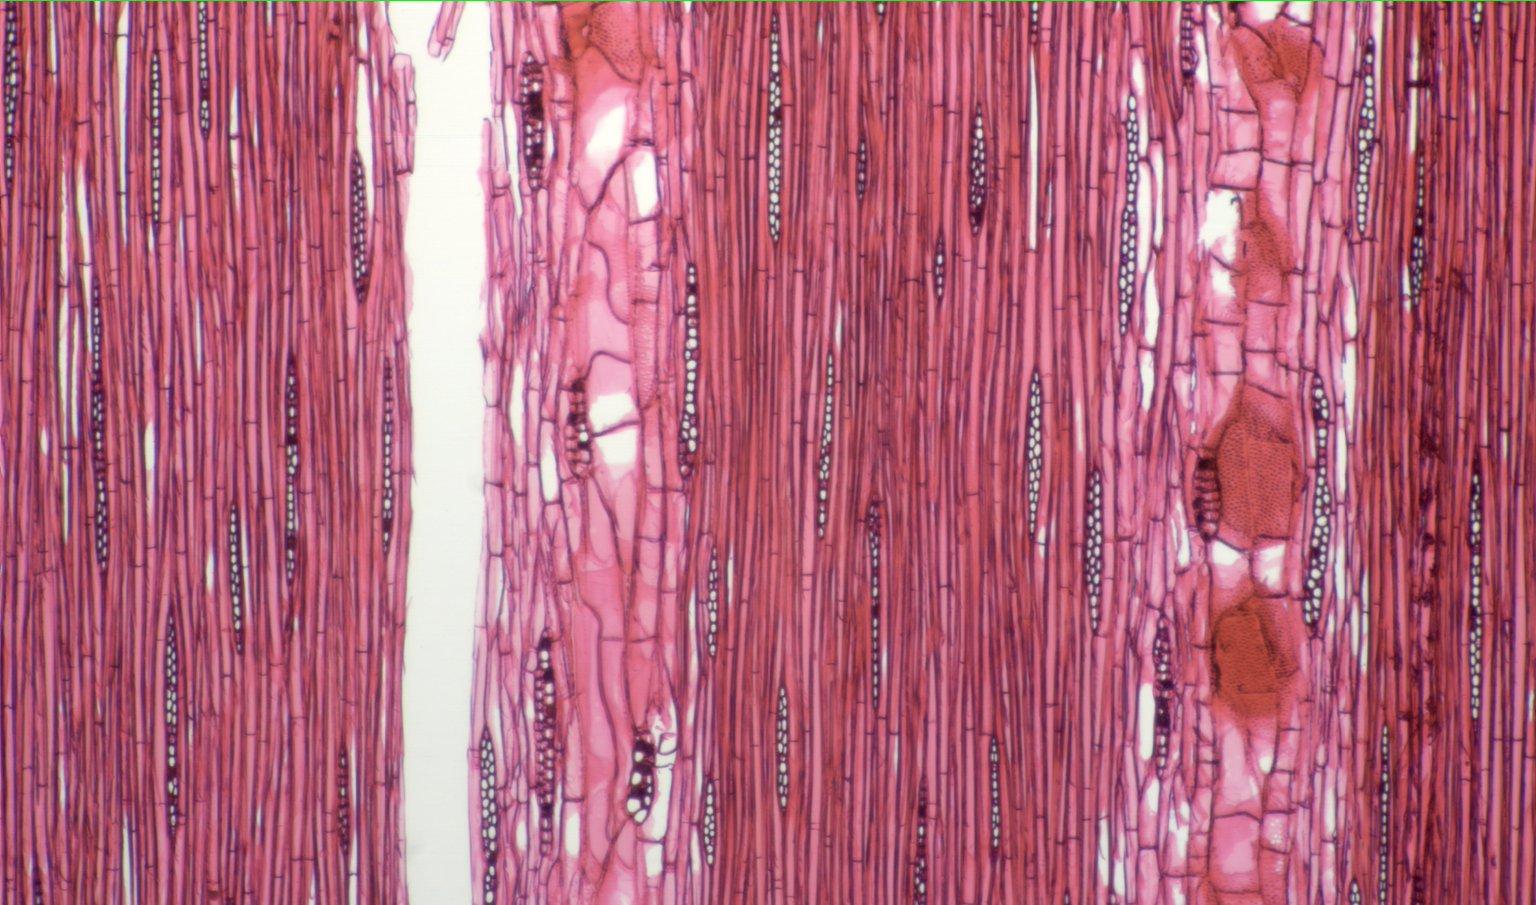 LEGUMINOSAE CAESALPINIOIDEAE Mimosoid Clade Albizia splendens